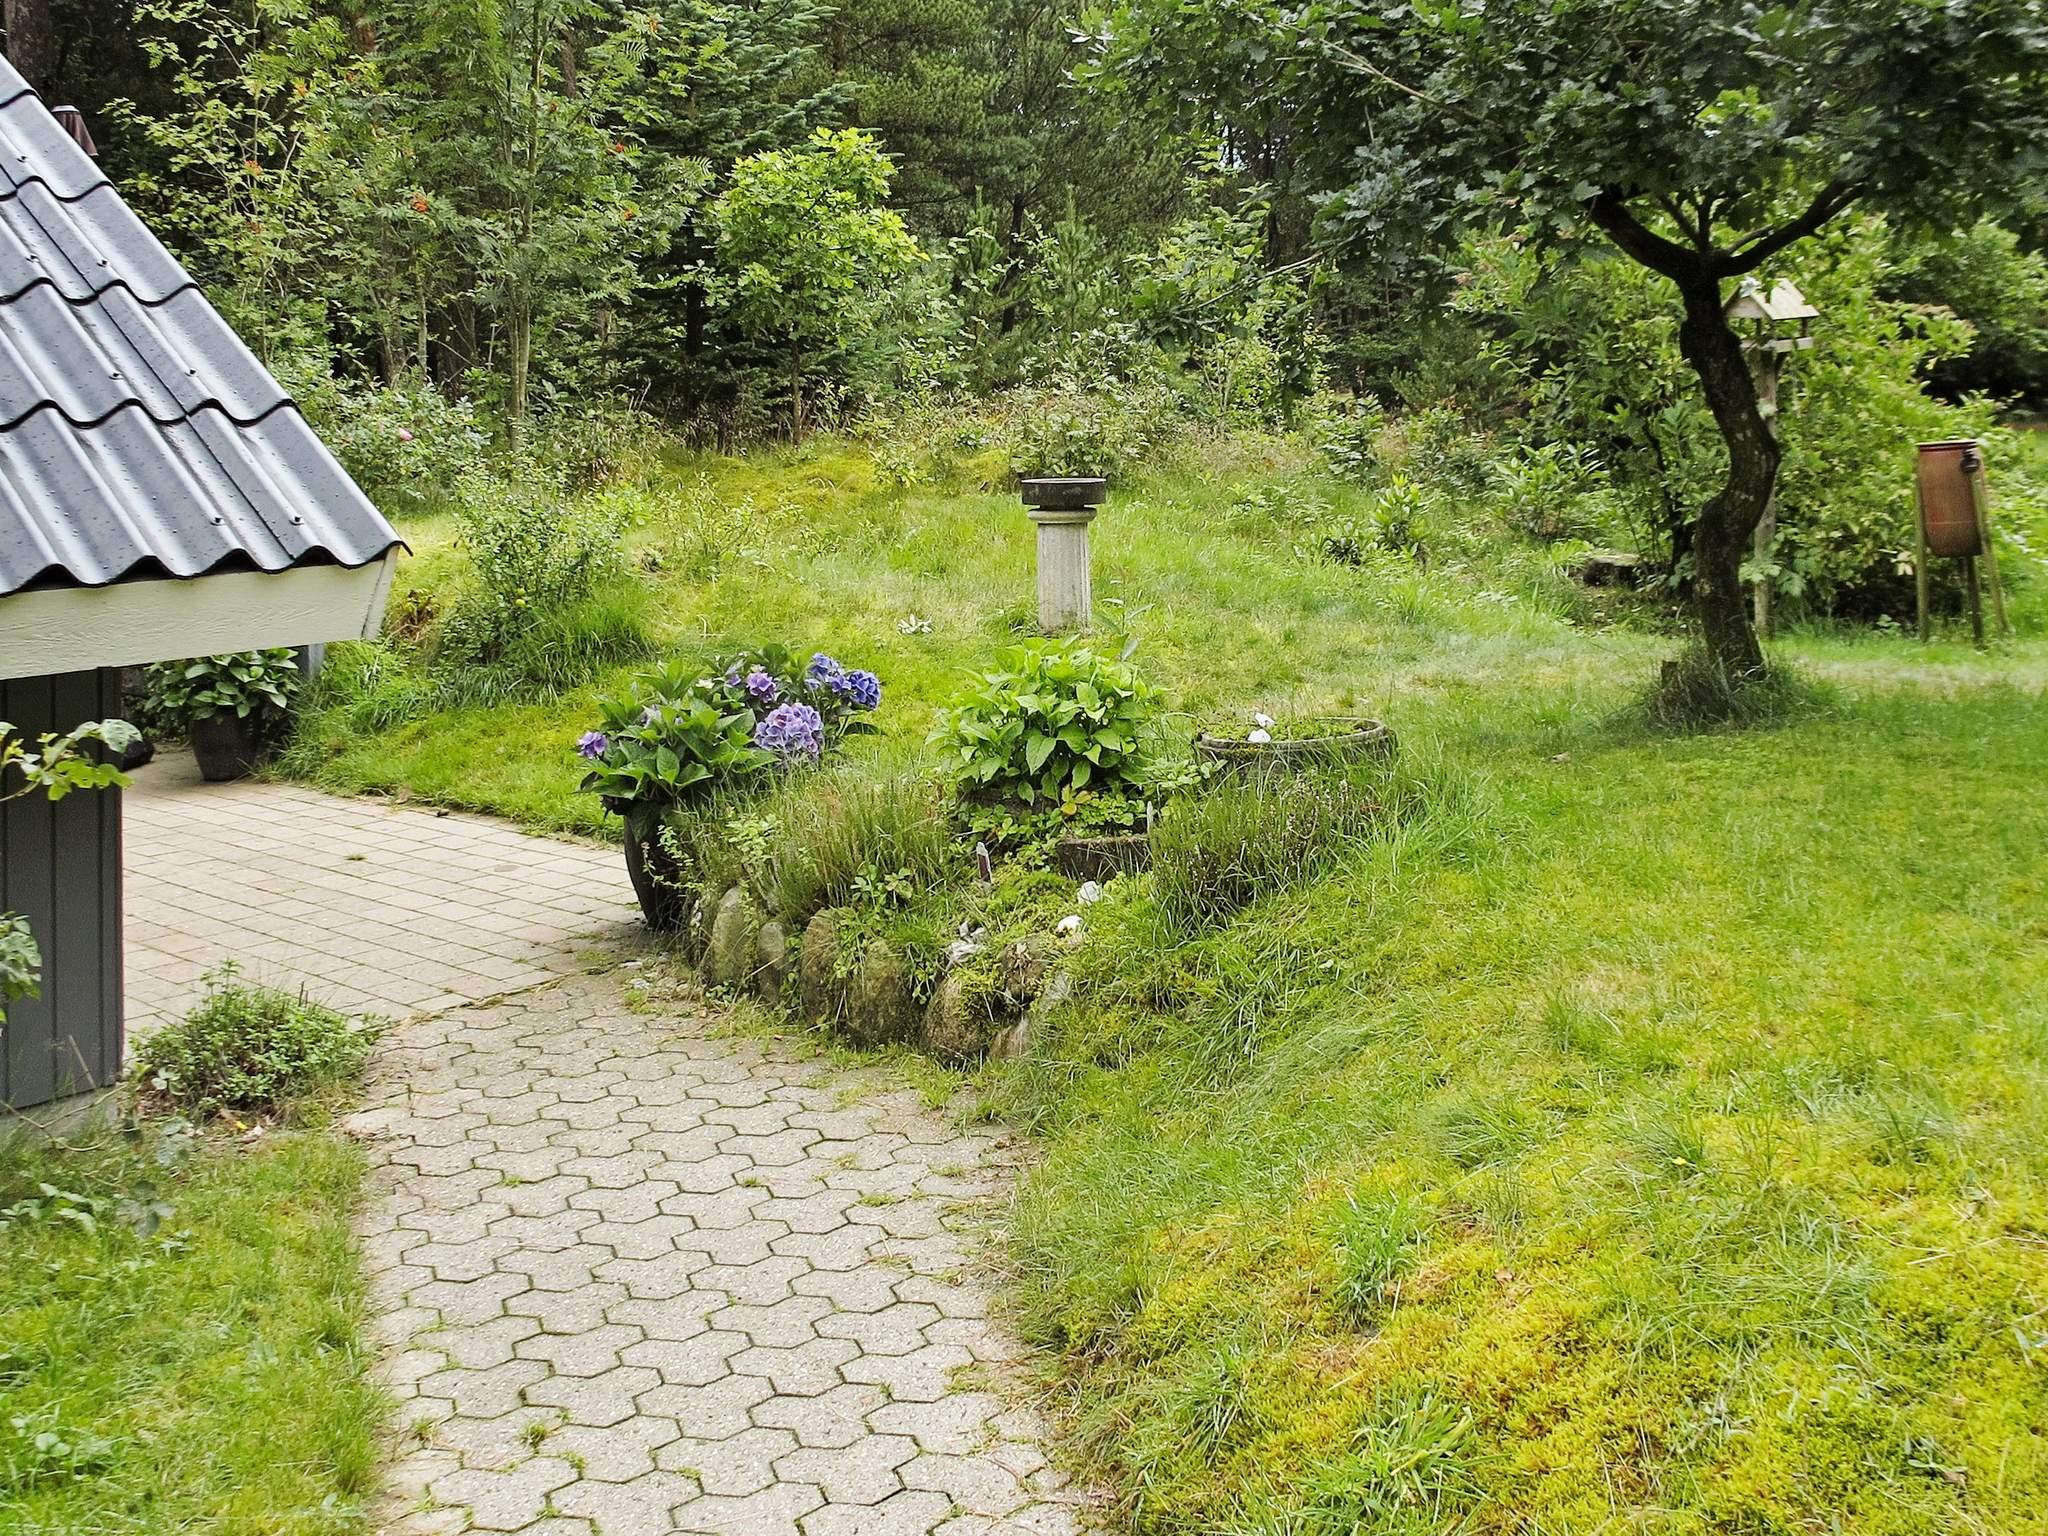 Ferienhaus Hou Nord/Melholt (88048), Hou, , Nordostjütland, Dänemark, Bild 36